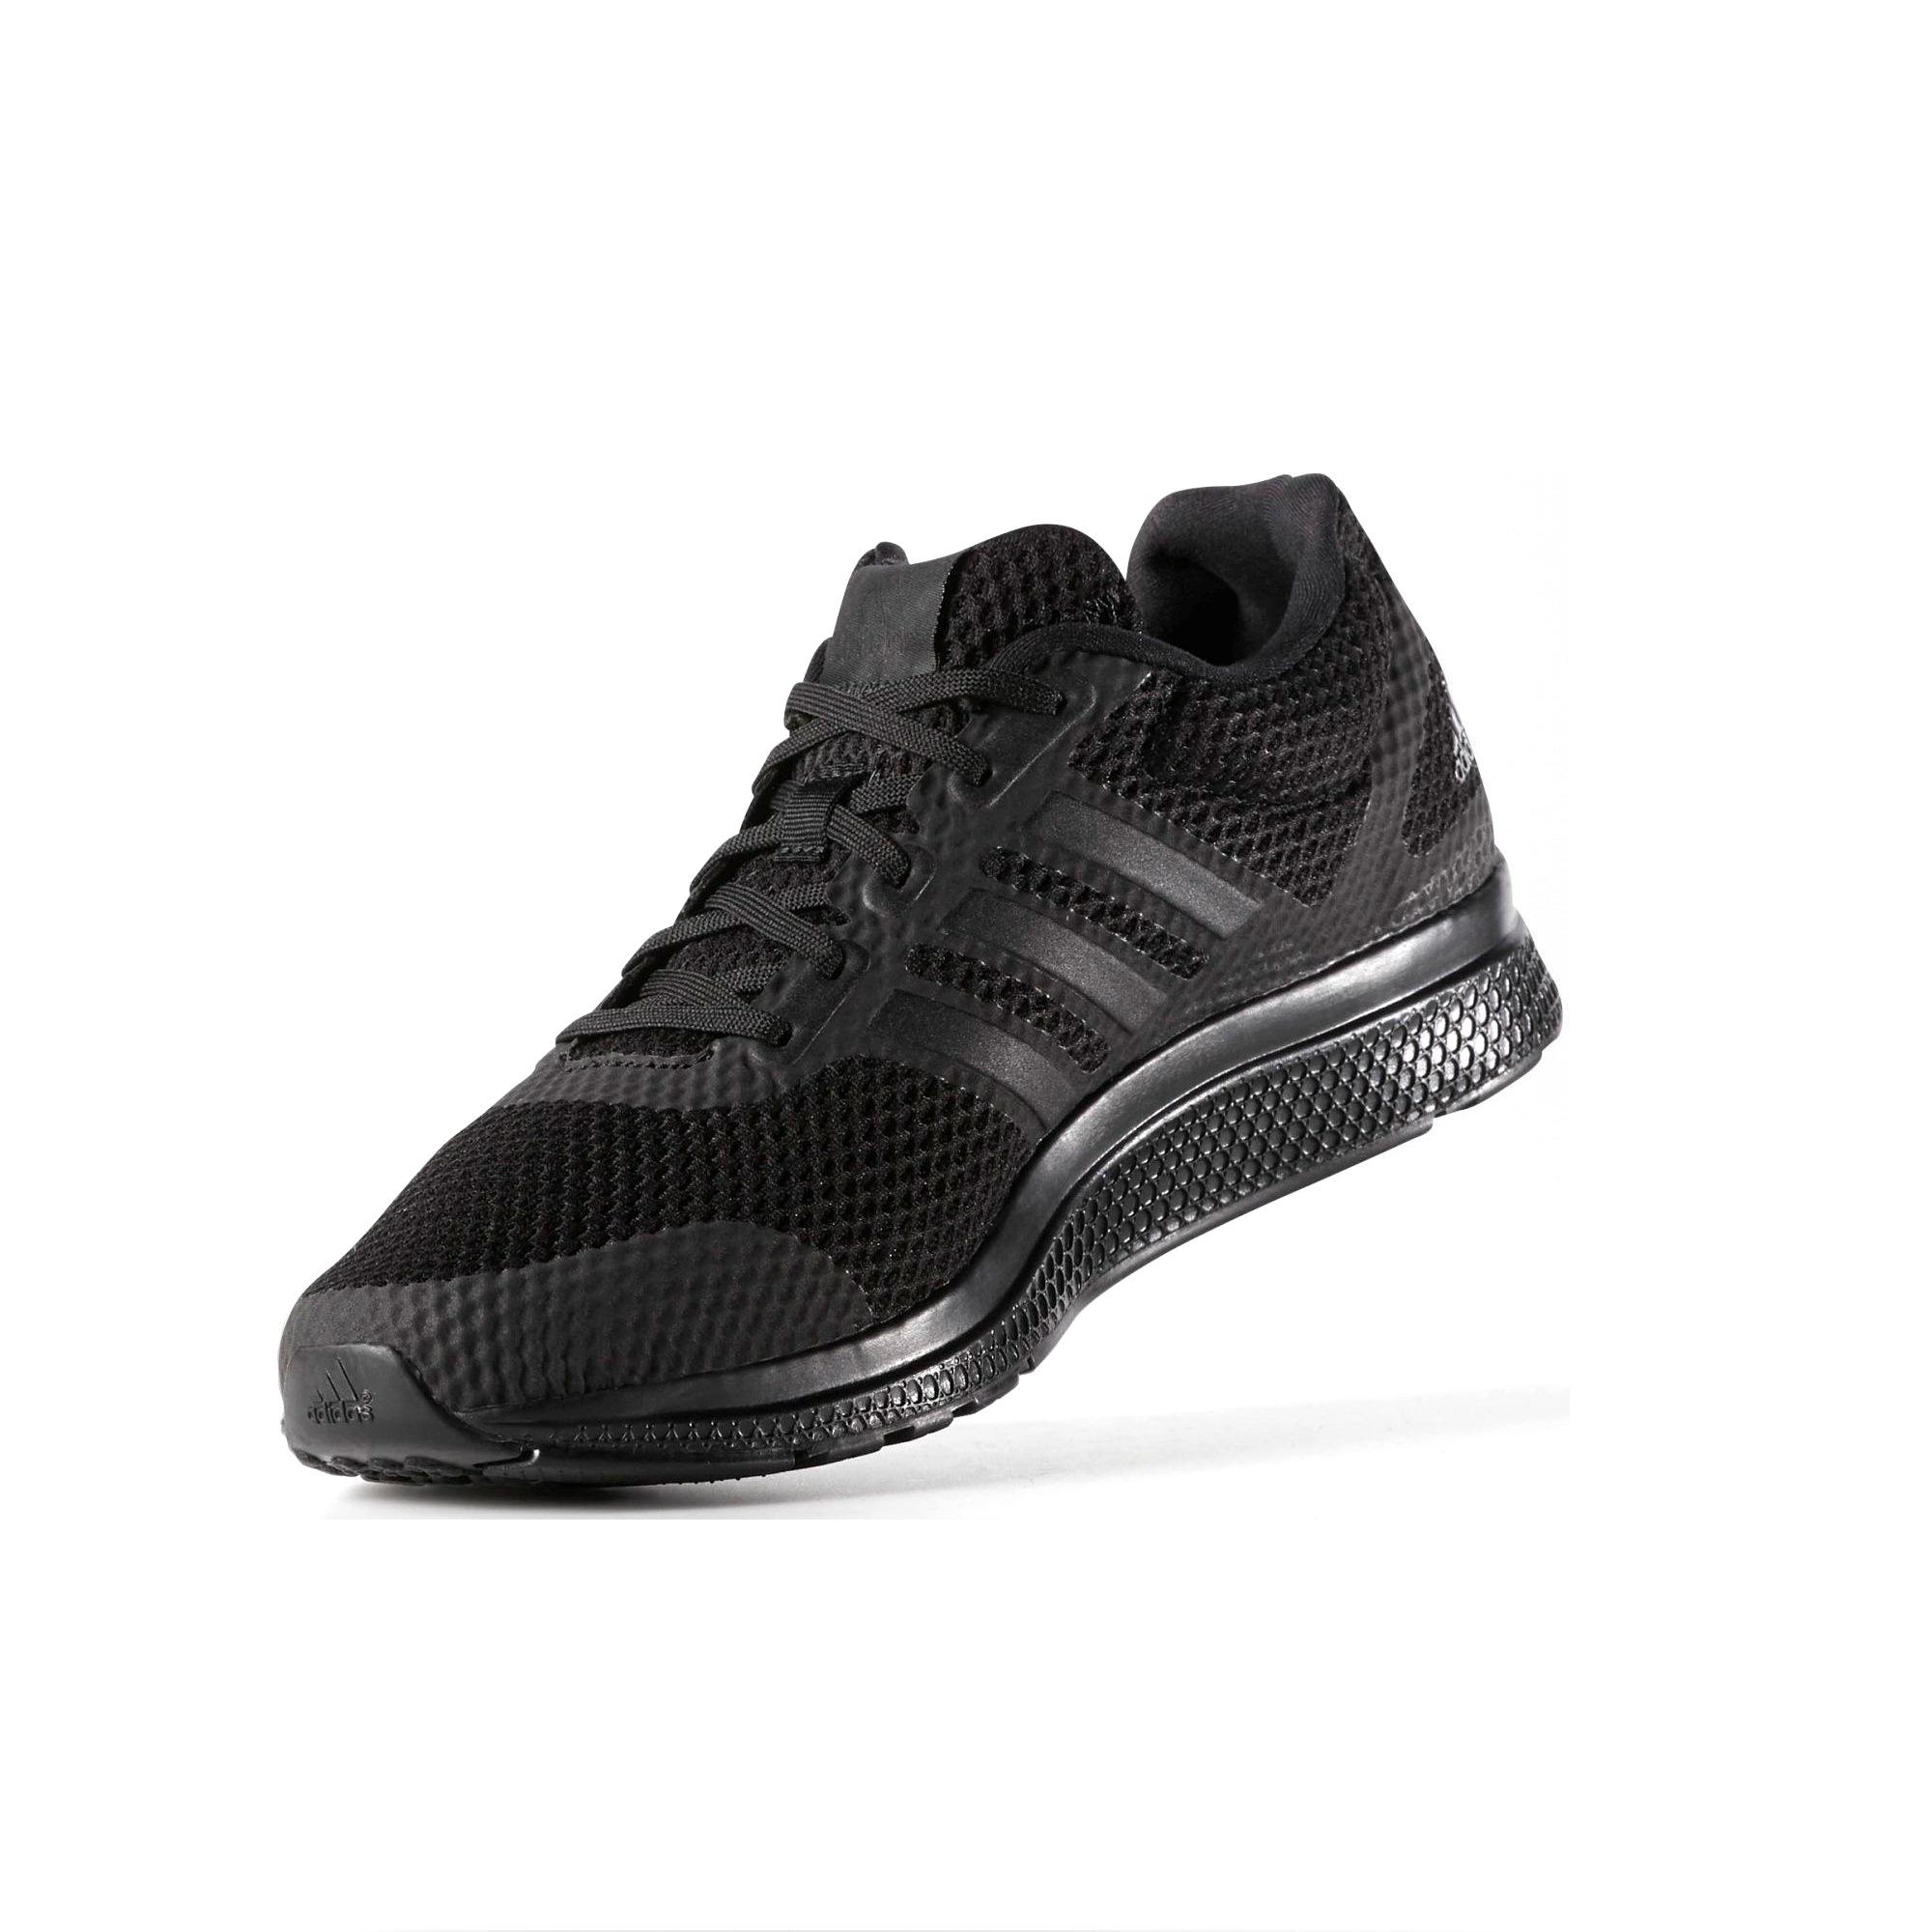 53d8744dc Adidas-Men-039-s-Running-Mana-Bounce-Shoes thumbnail